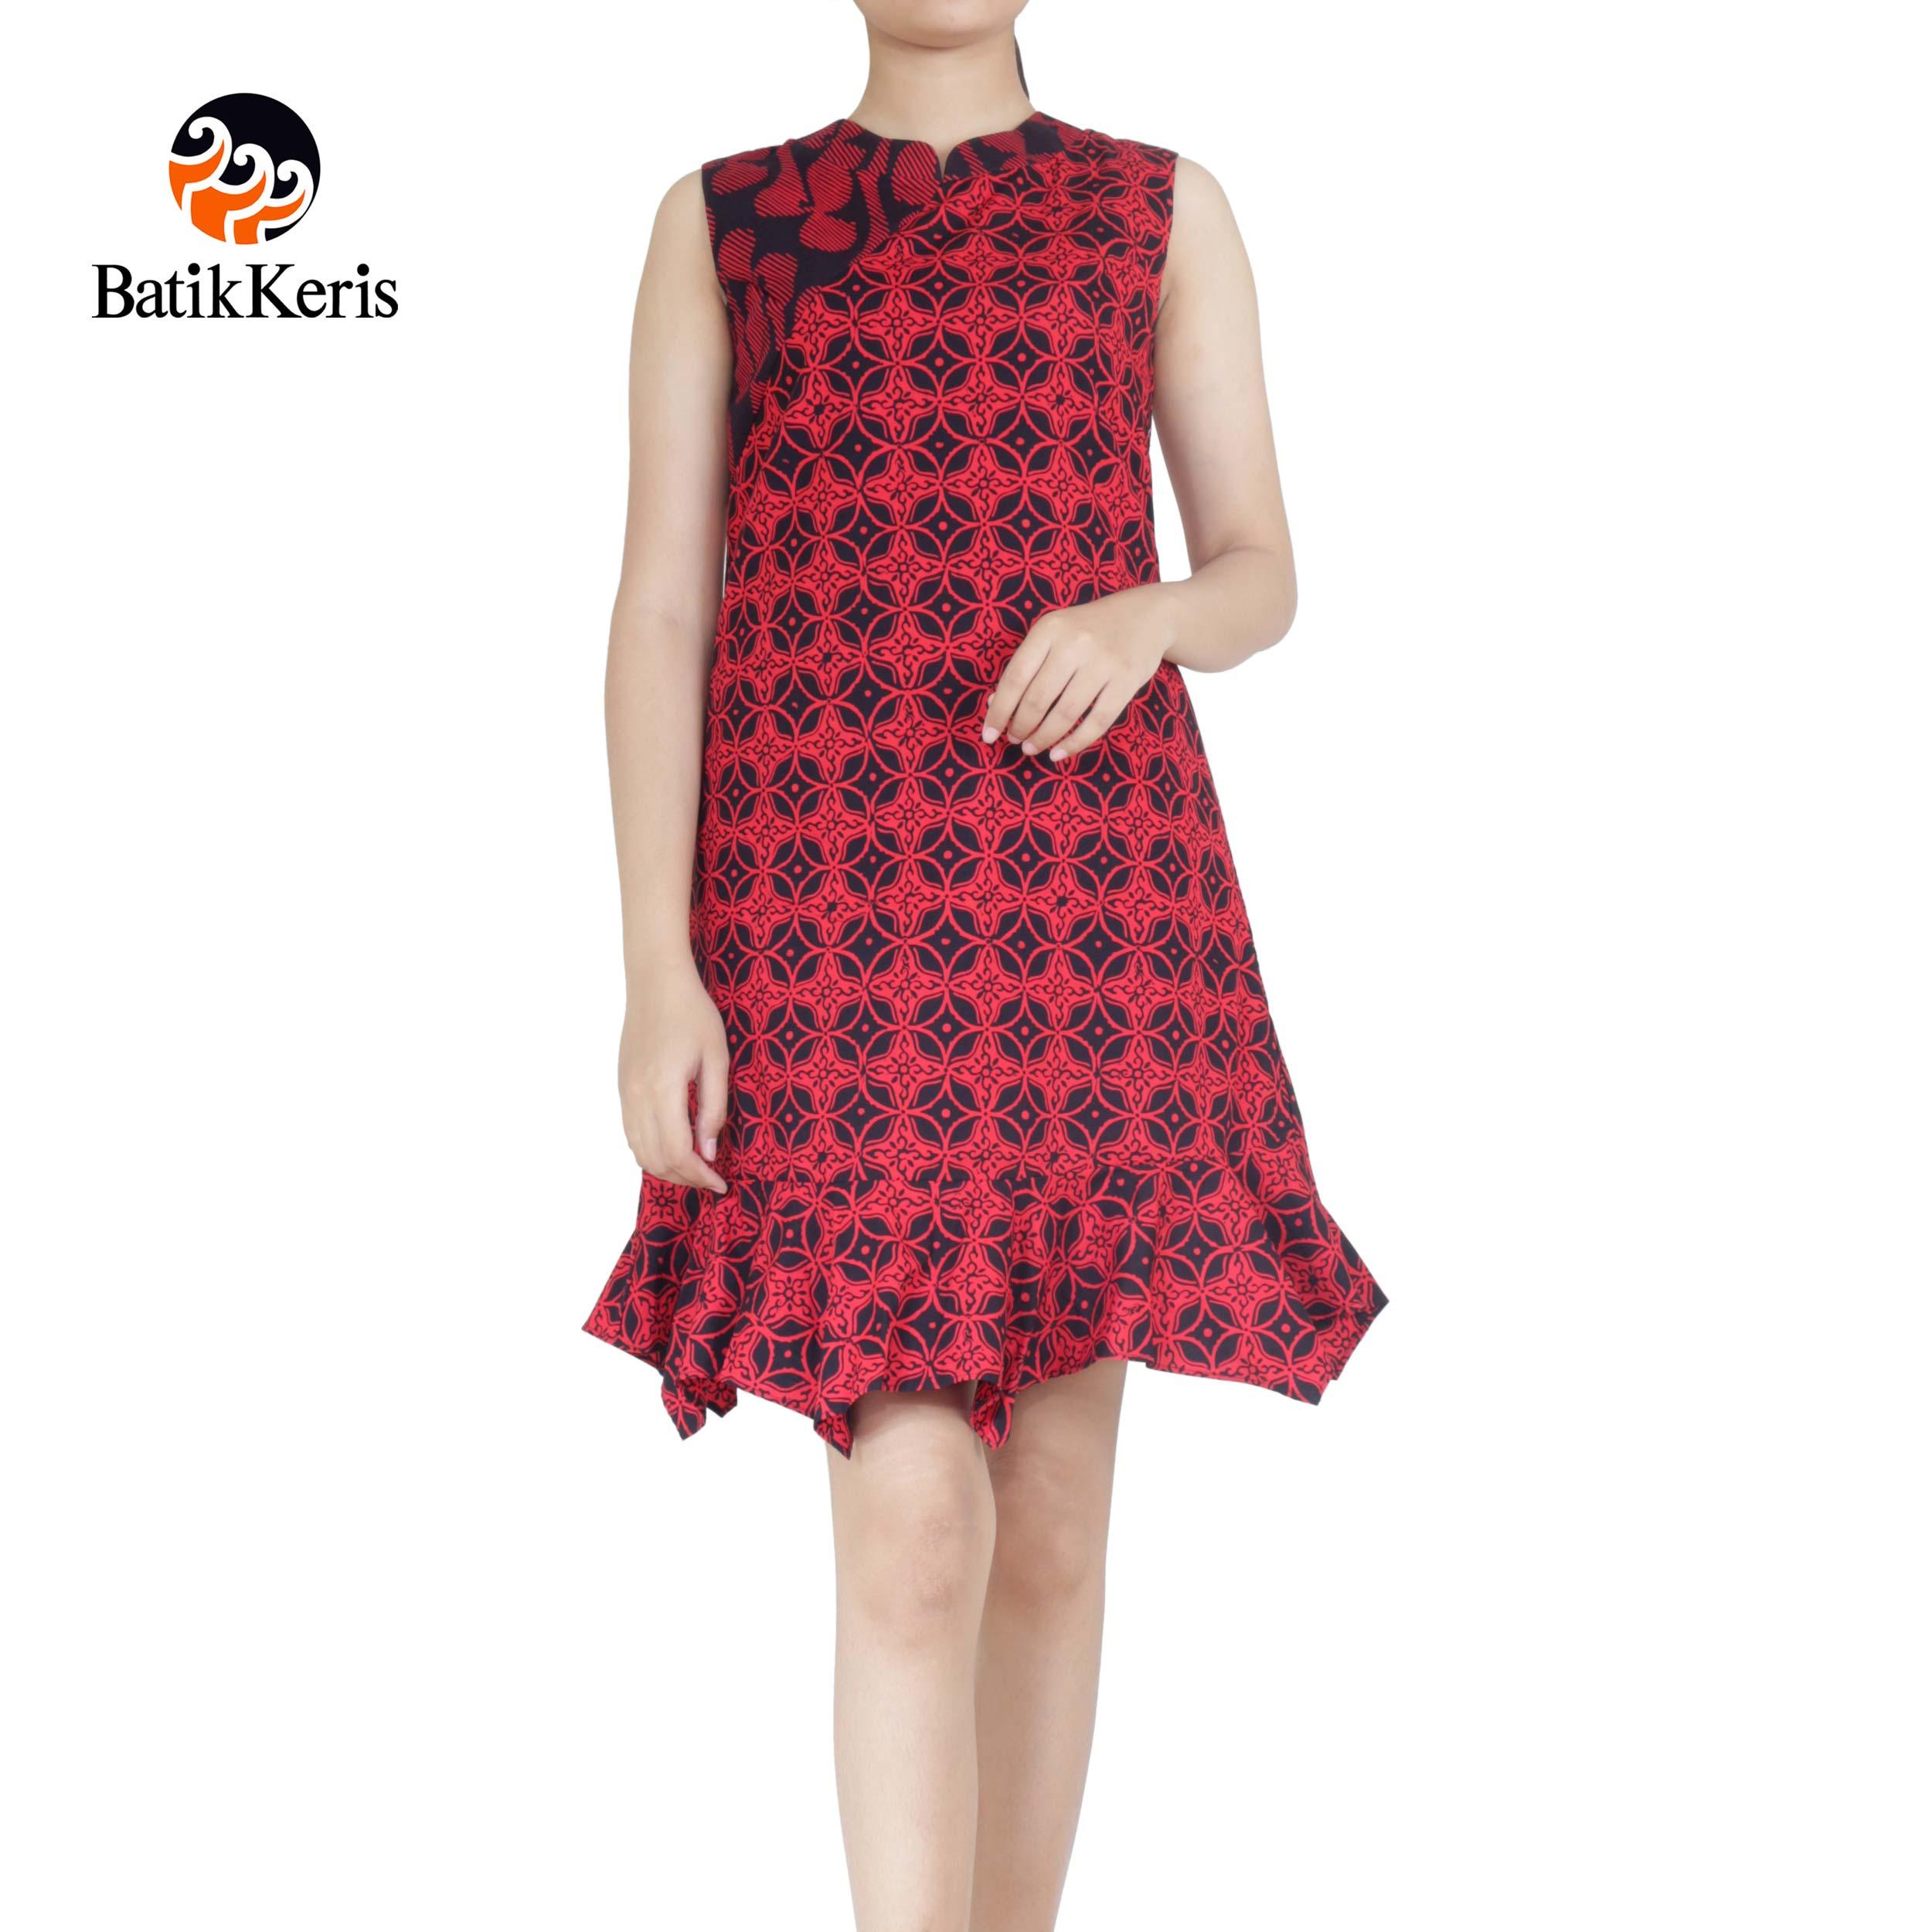 Batik Keris Online » SACKDRESS MOTIF KAWUNG KOMBINASI PARANG 4eaf318568